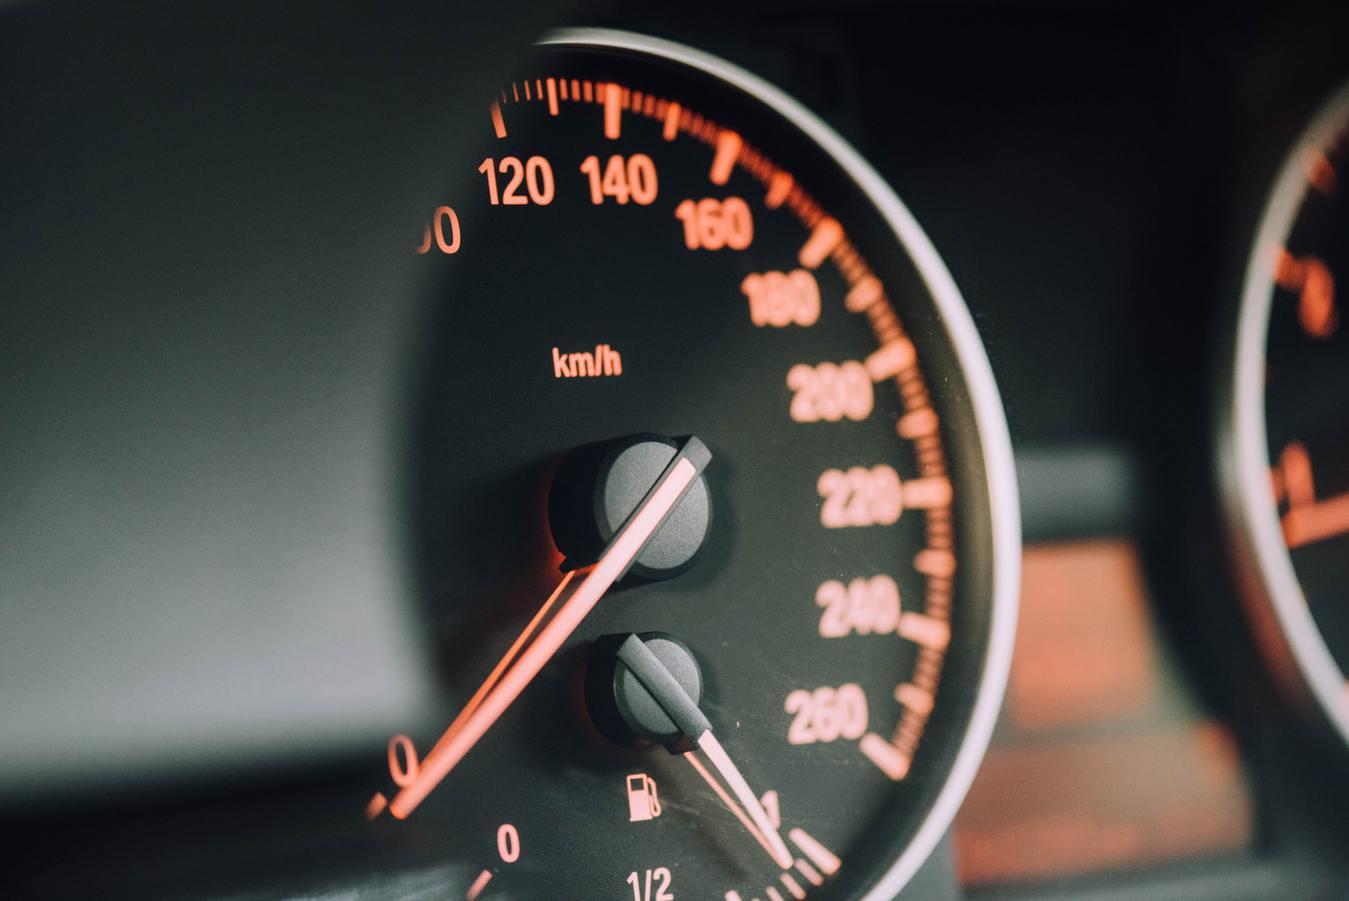 Pengukur kecepatan kendaraan